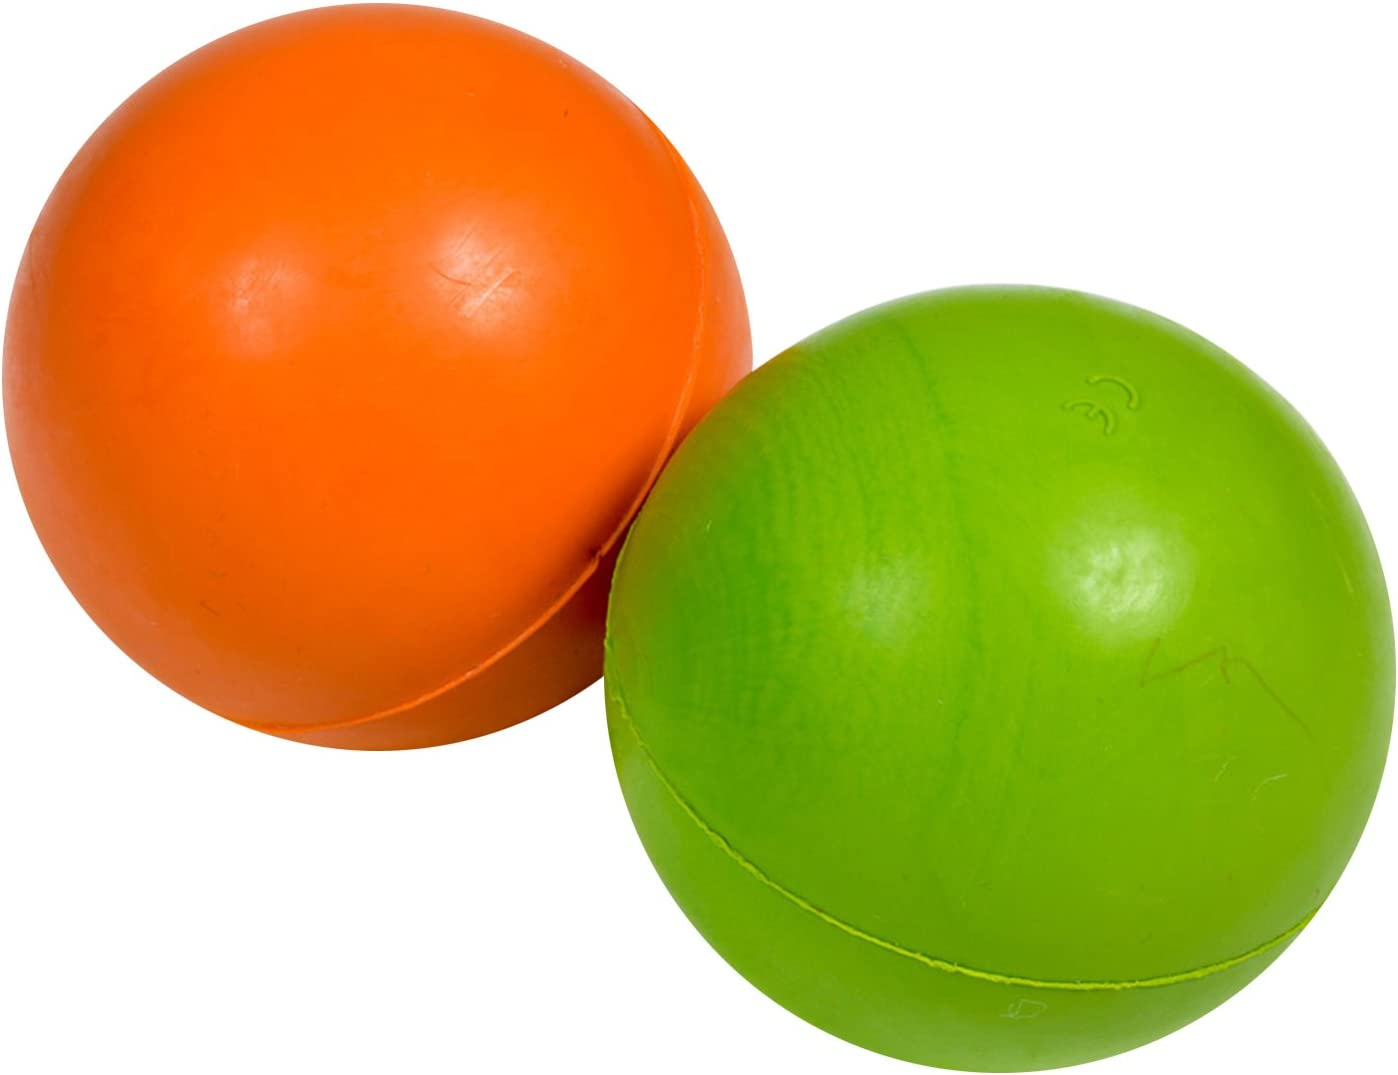 Petface Bola de Goma Maciza Perro de Juguete, 7,5 cm, Verde ...